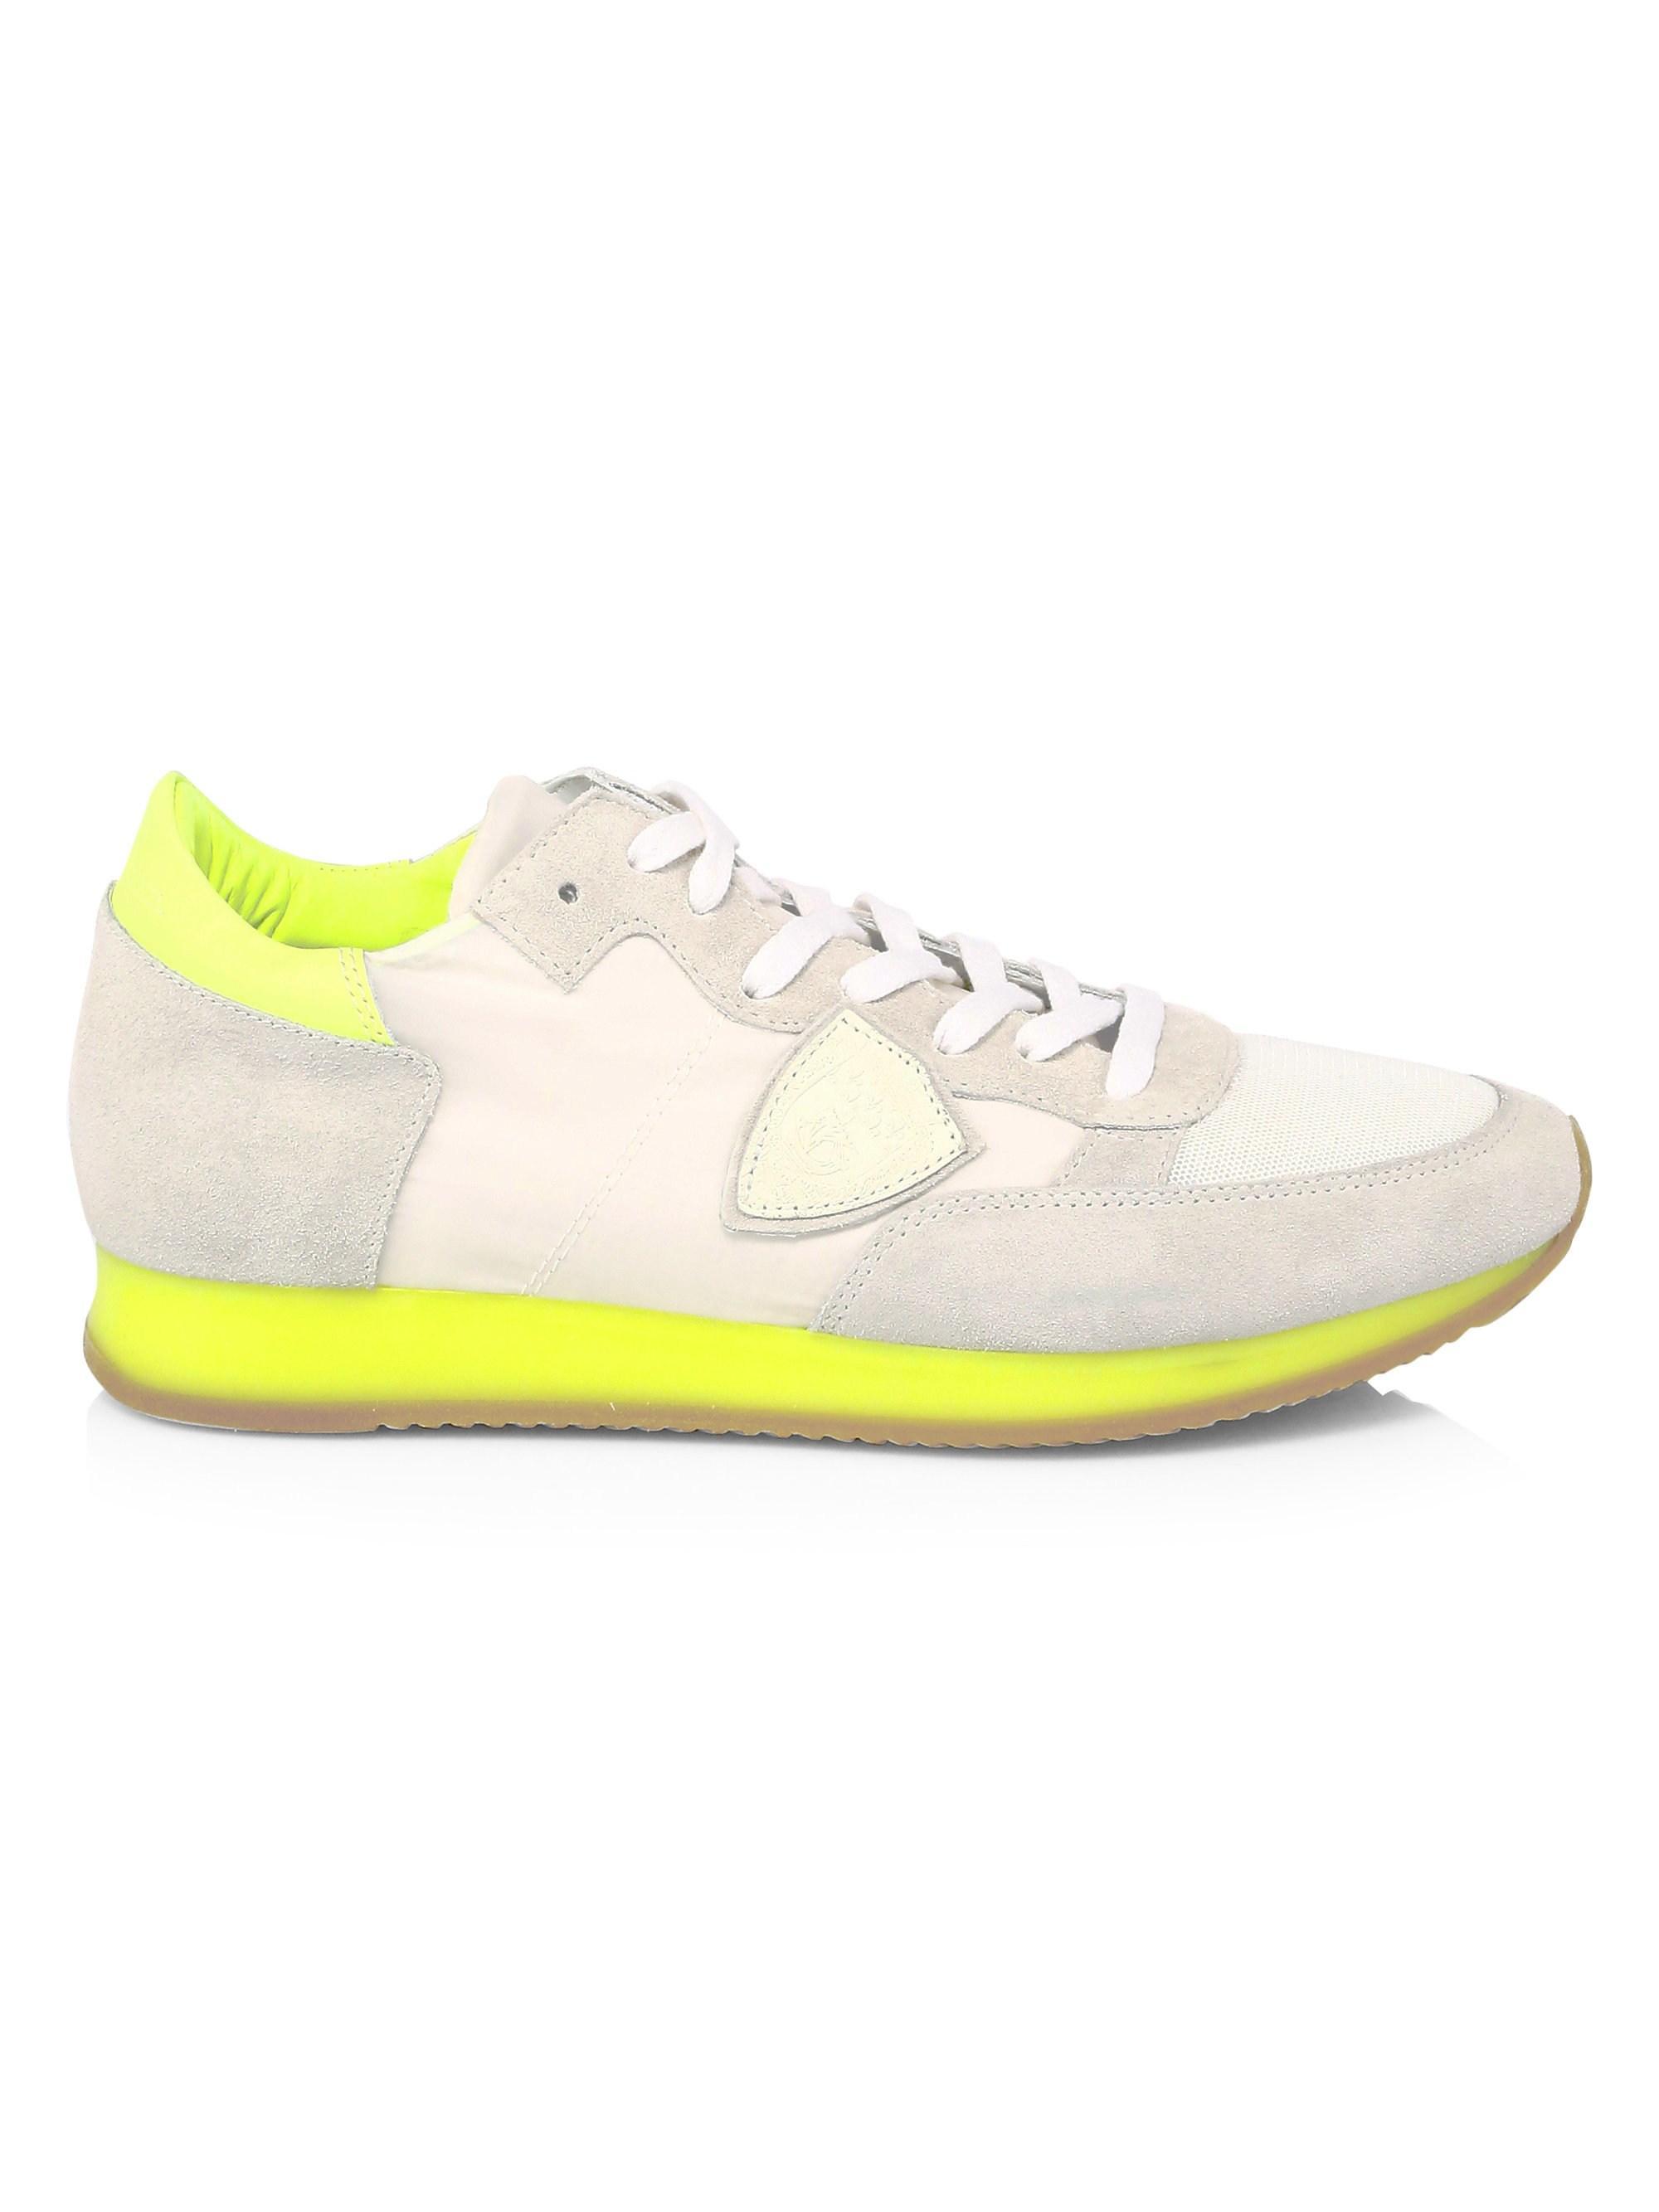 5639b27e89f Philippe model white yellow mens tropez neon platform wedge sneakers white  yellow size jpg 2000x2667 Neon